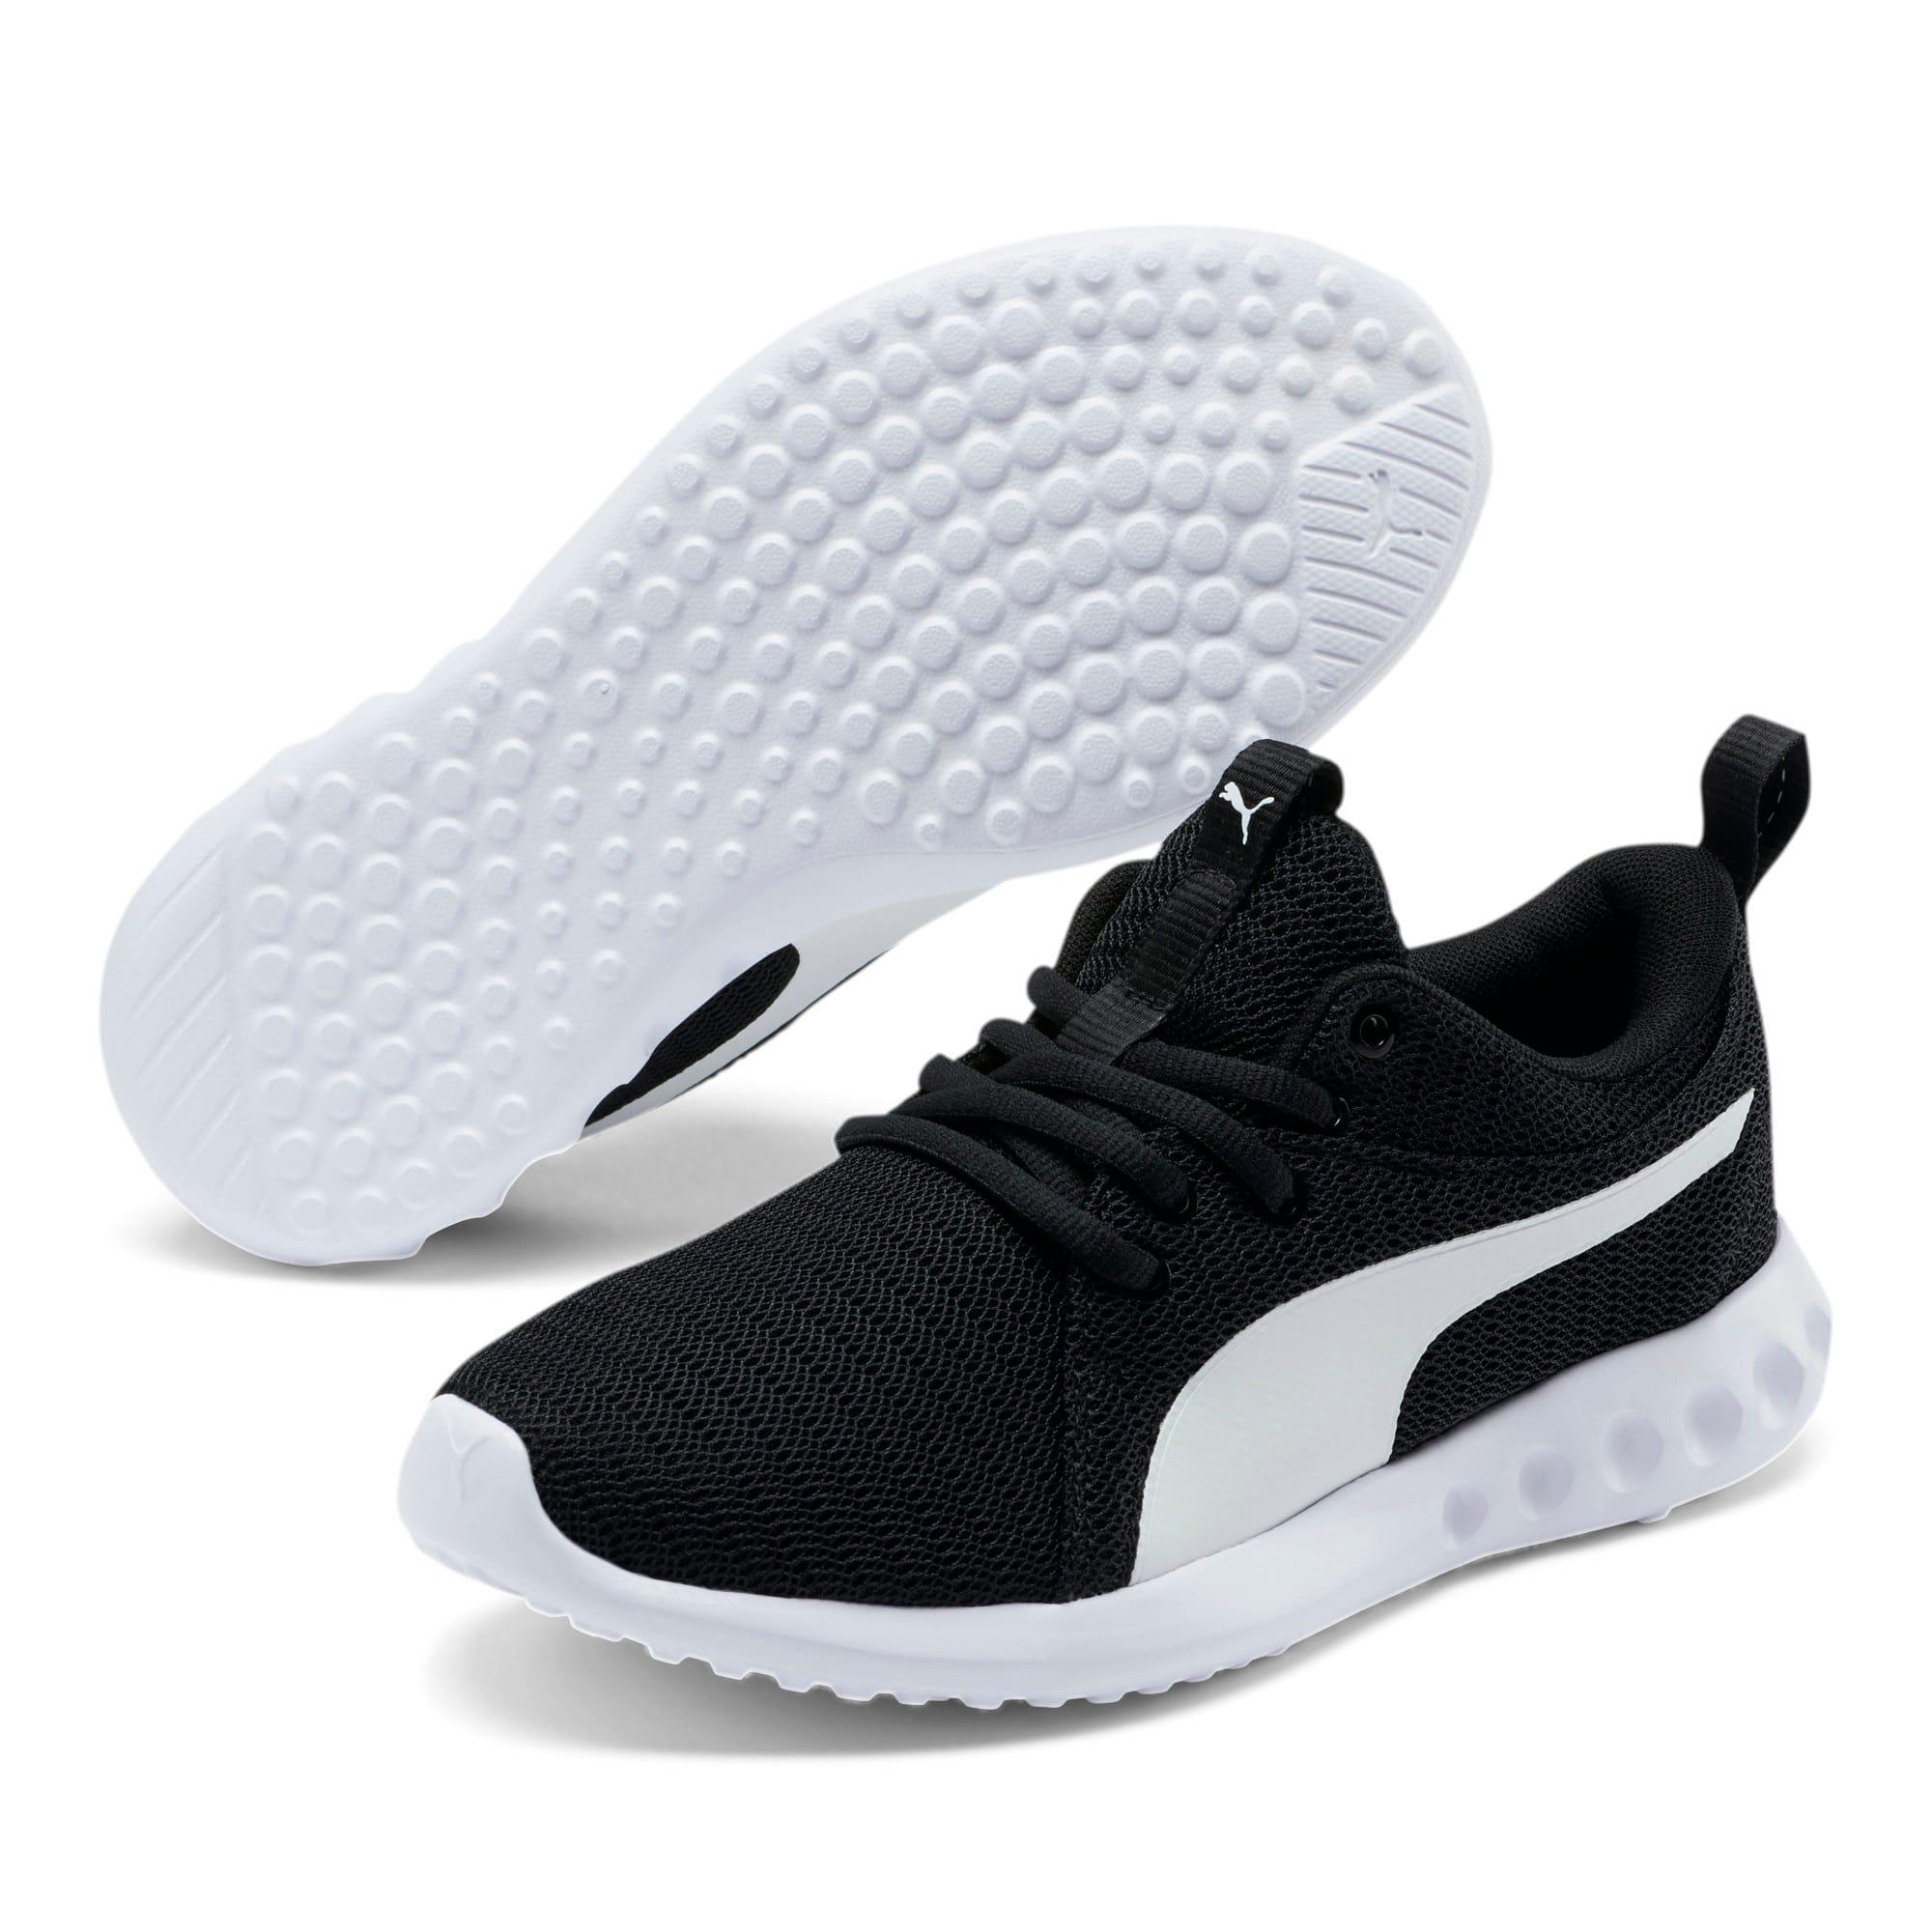 Thumbnail 2 of Carson 2 Sneakers JR, Puma Black-Puma White, medium